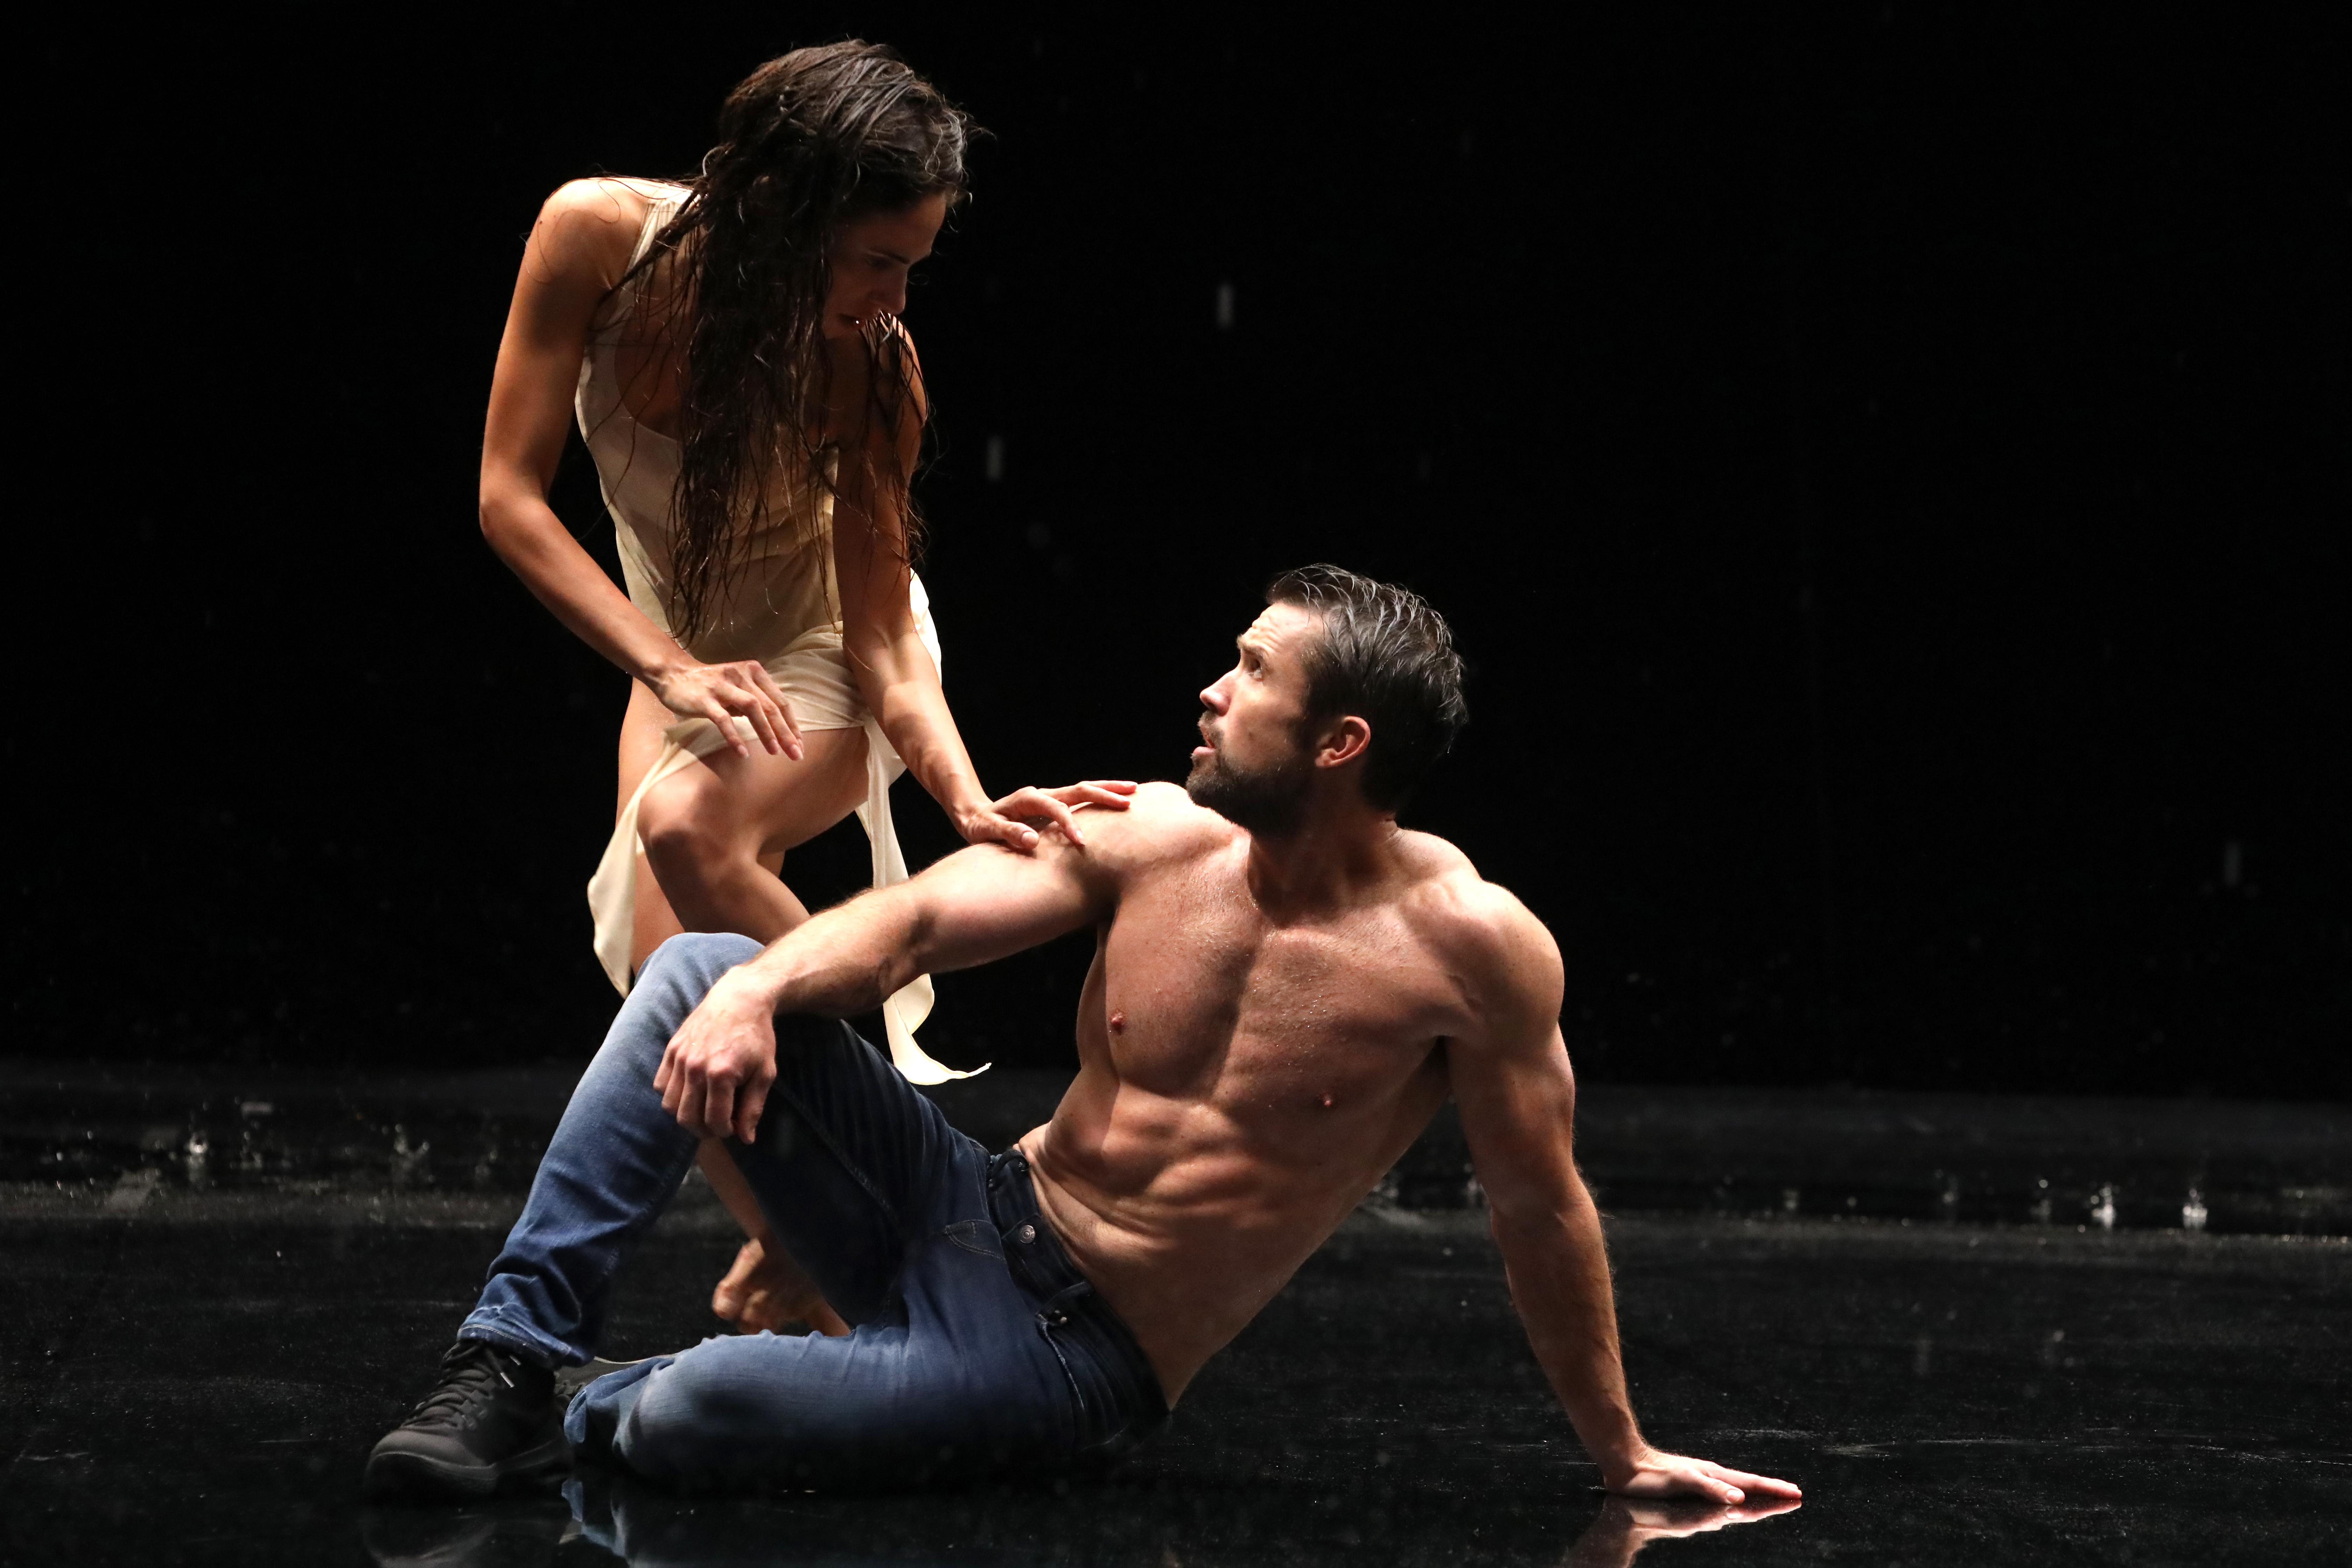 TV's Most Memorable Dance Sequences, According to Critics